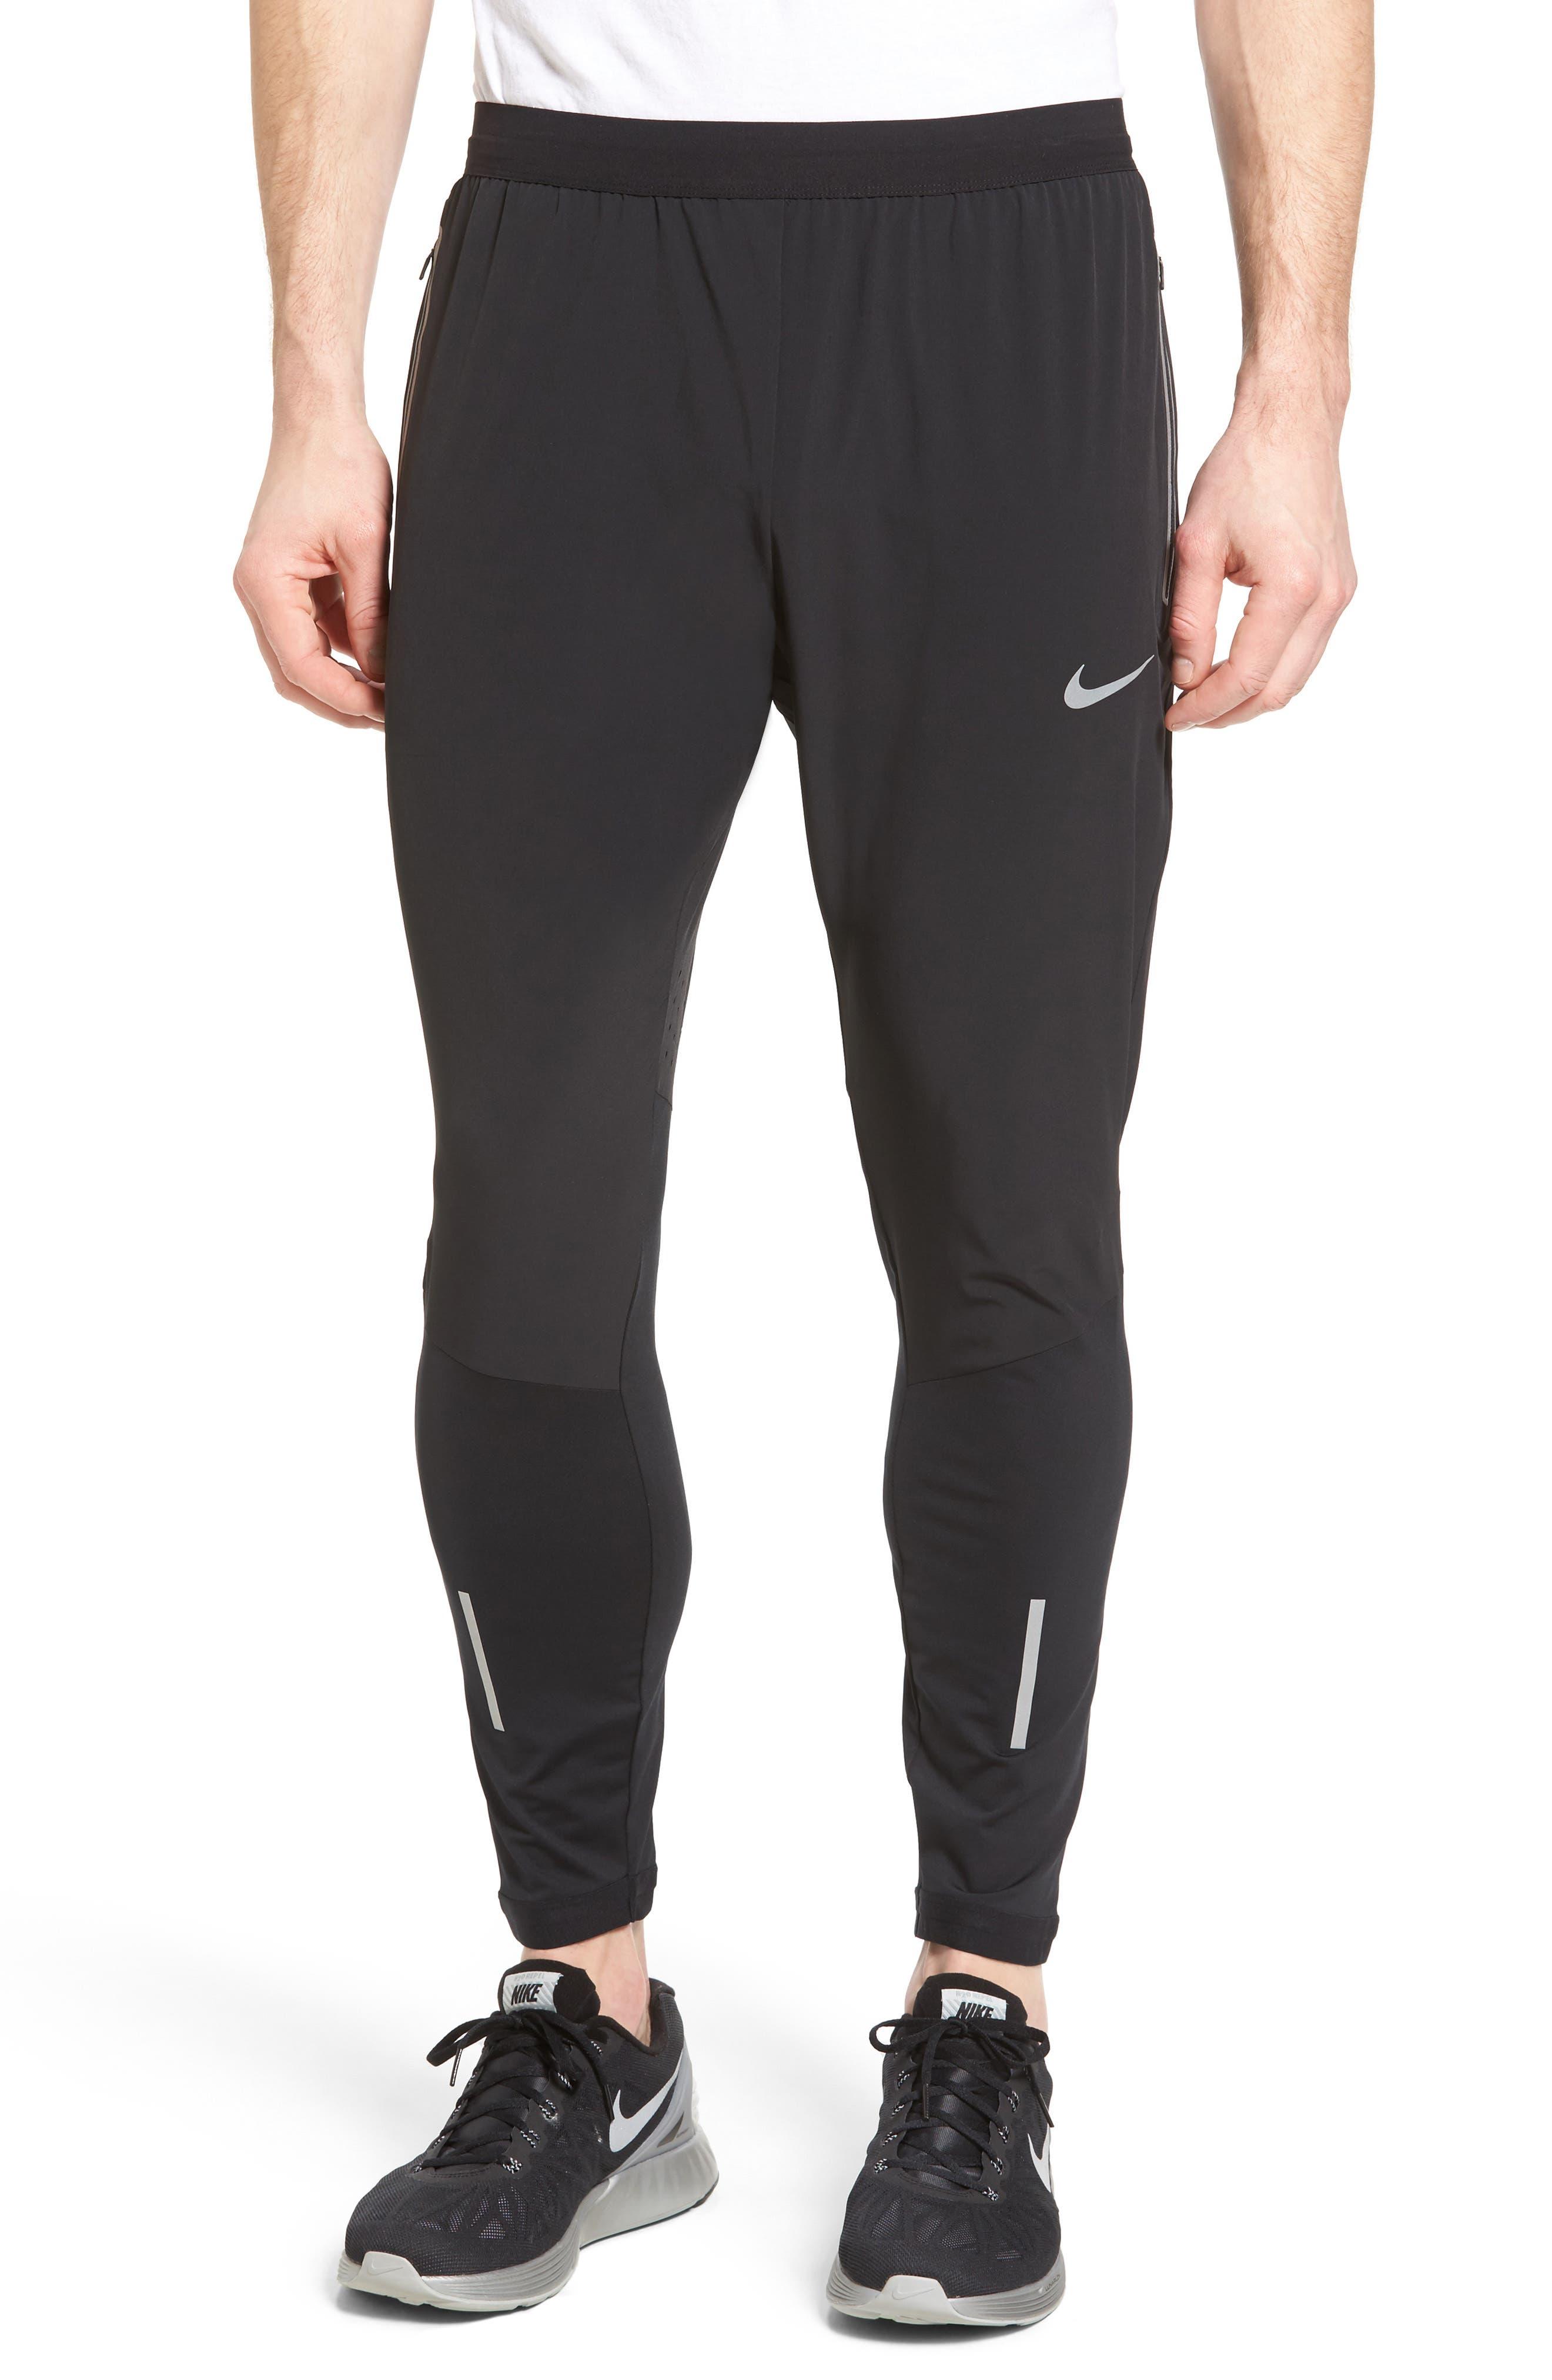 Nike Flex Running Pants